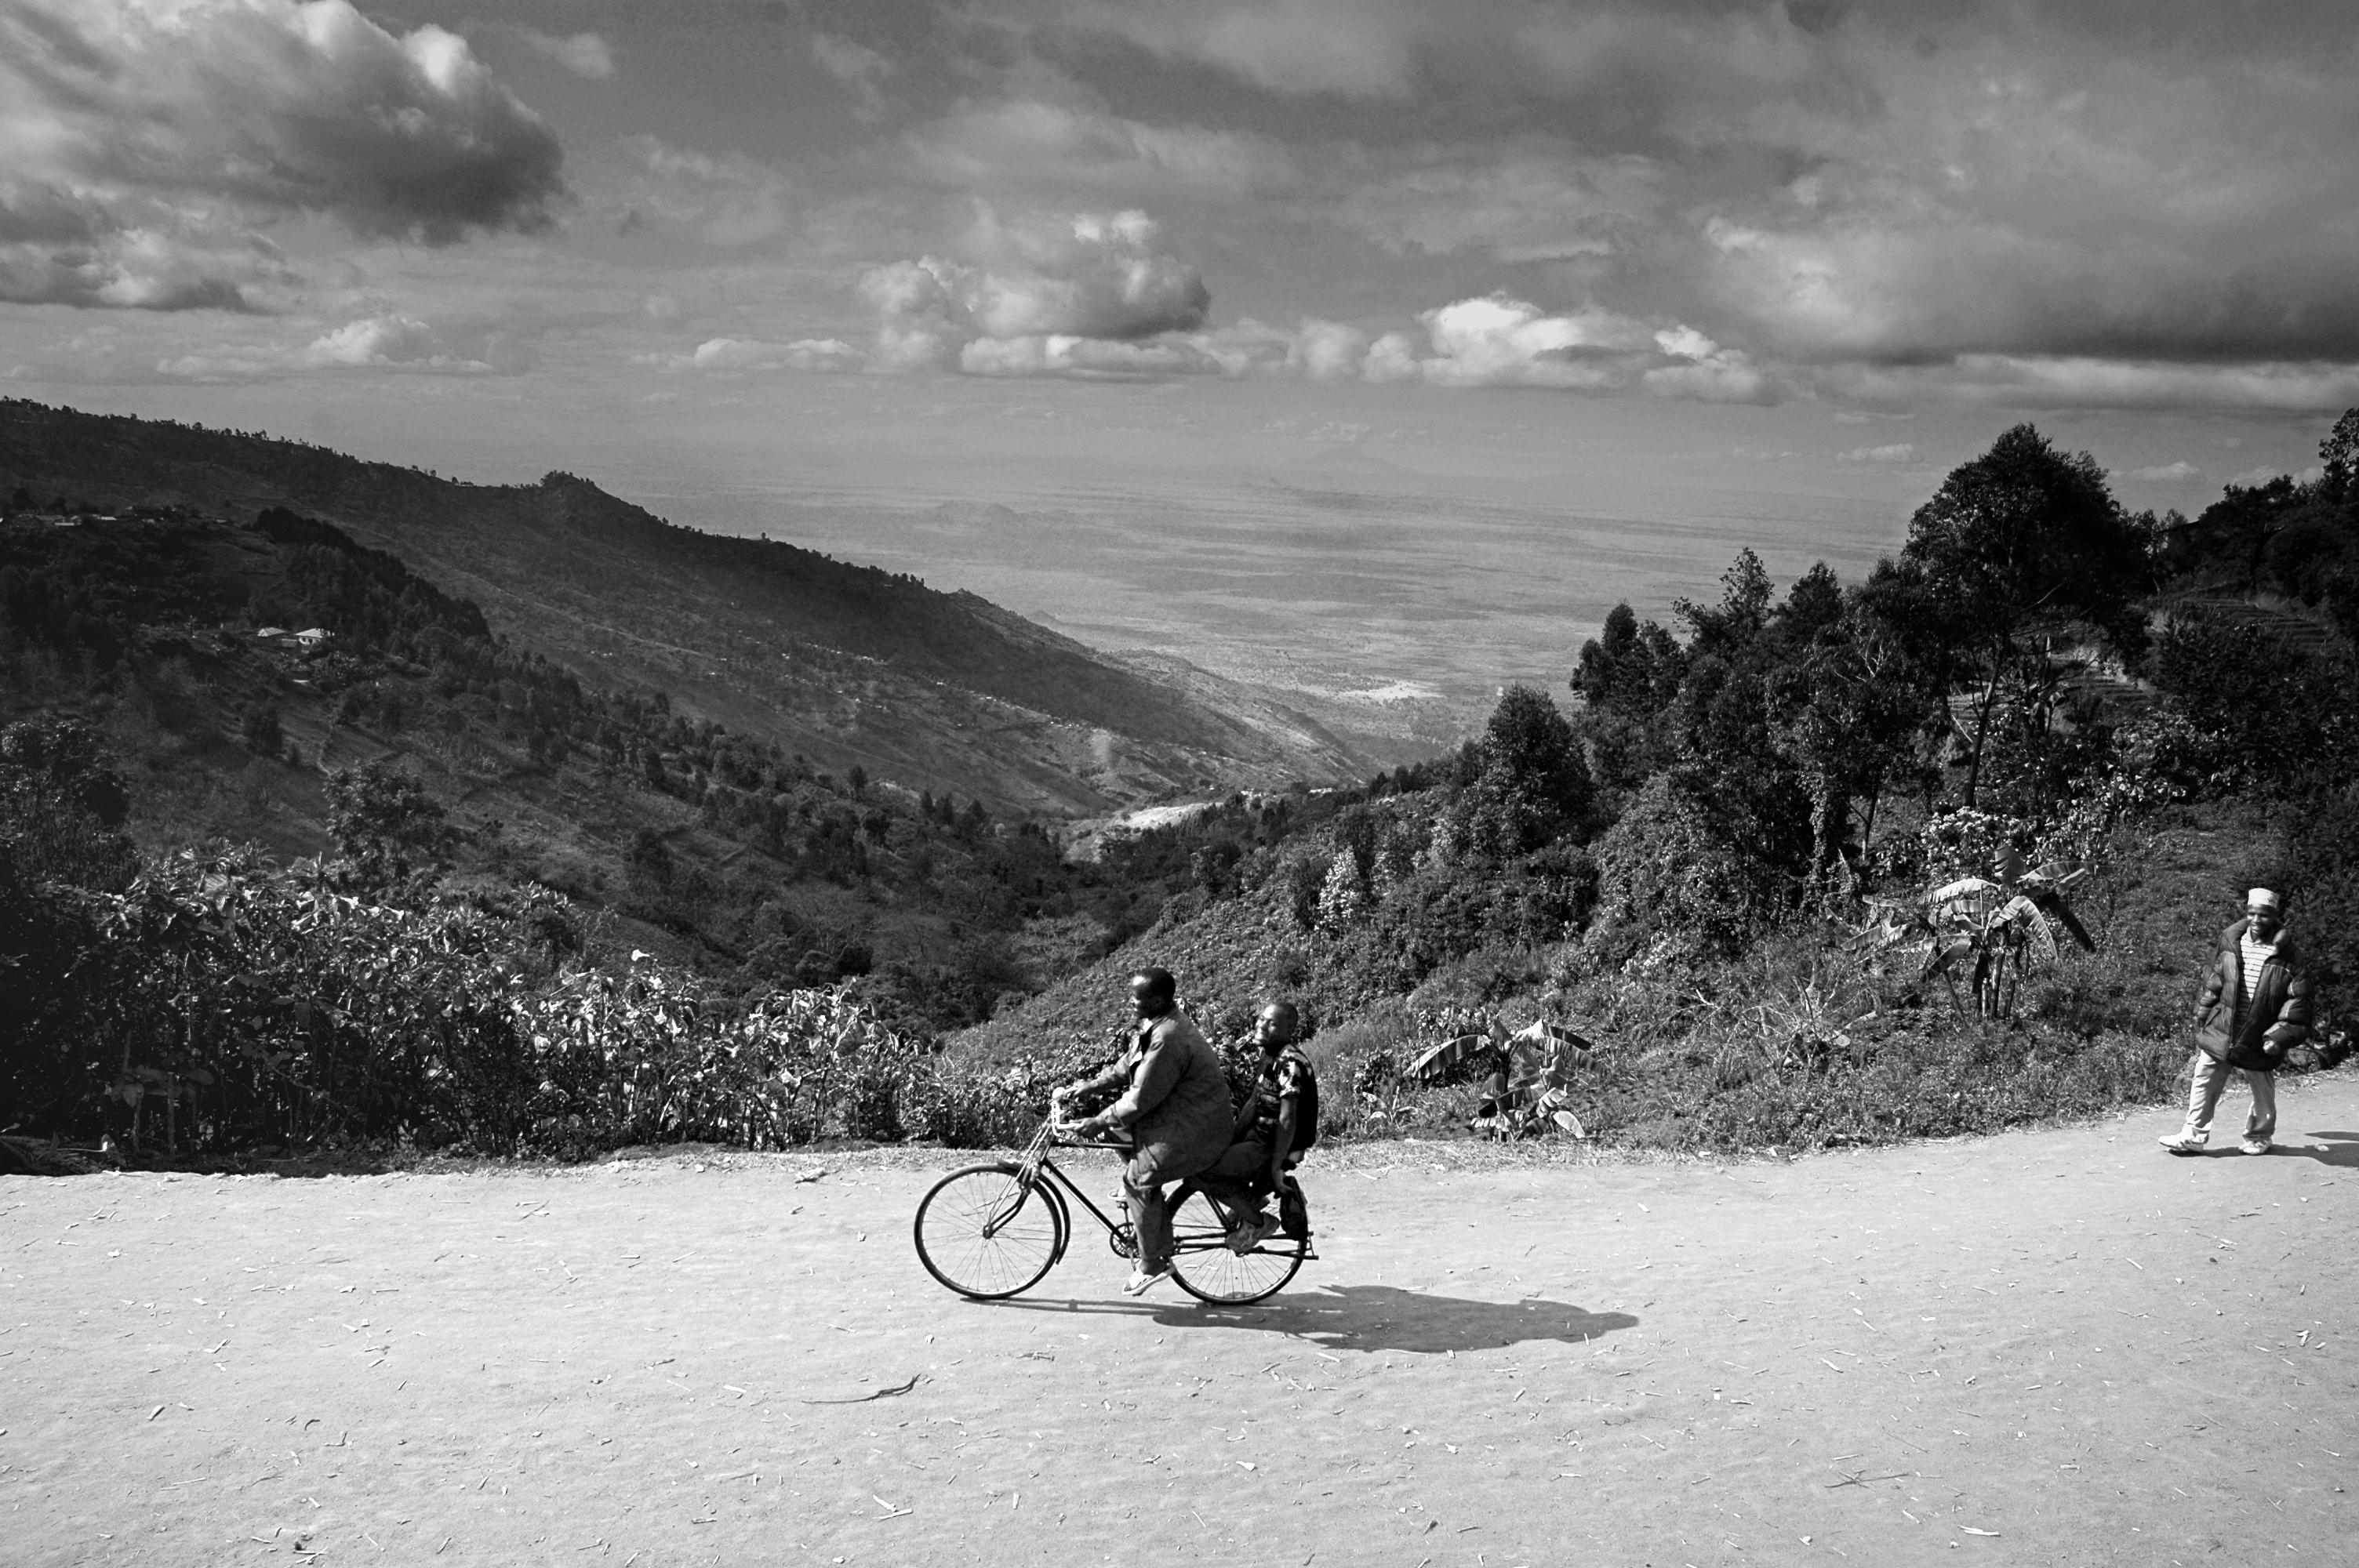 Bike on the mountain.jpg